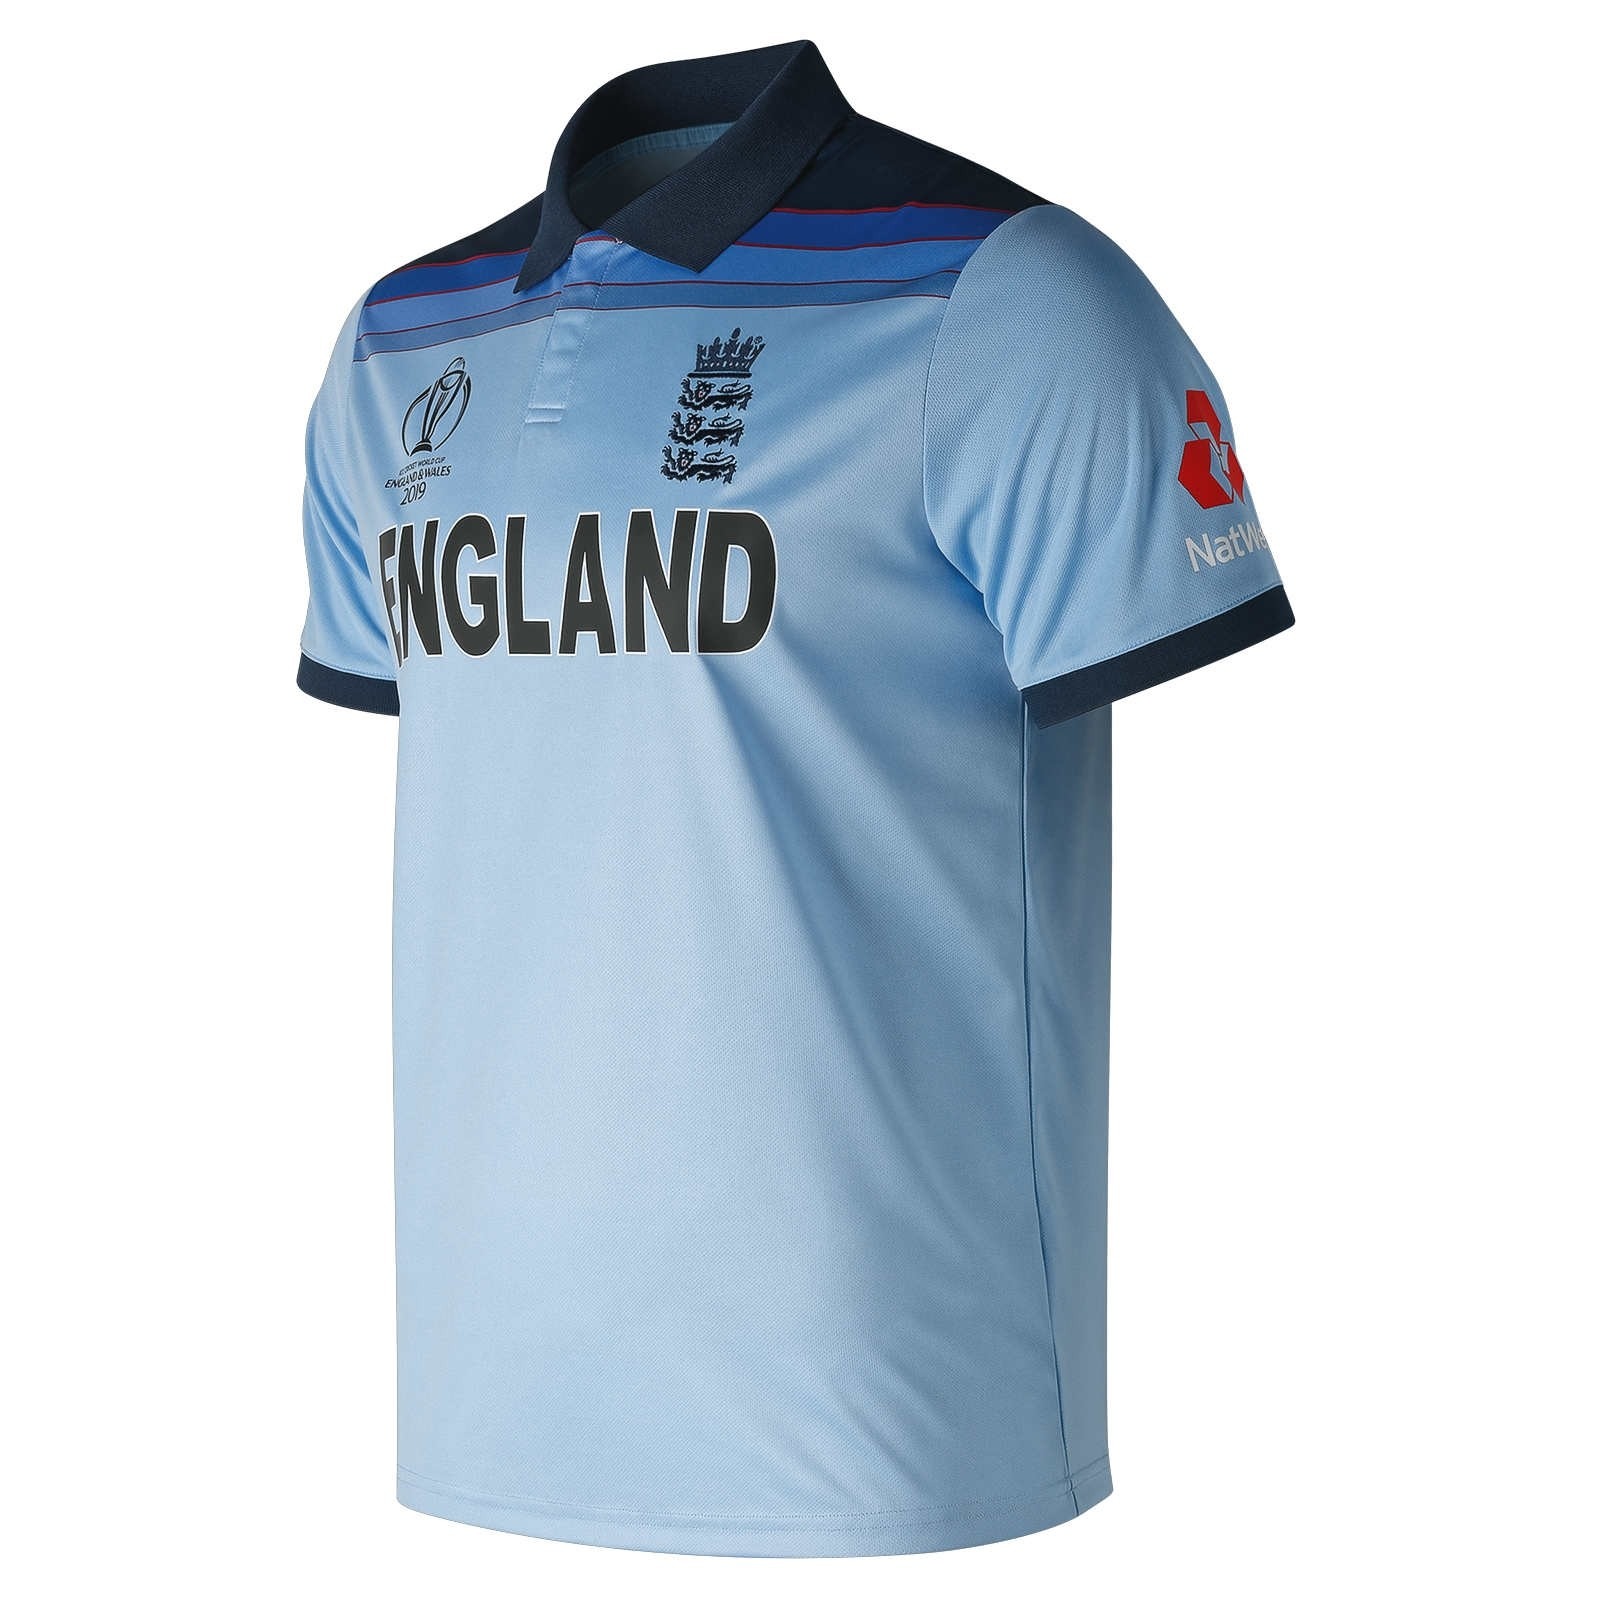 2019 New Balance England Cricket World Cup Winners ODI Replica Mens Cricket Shirt